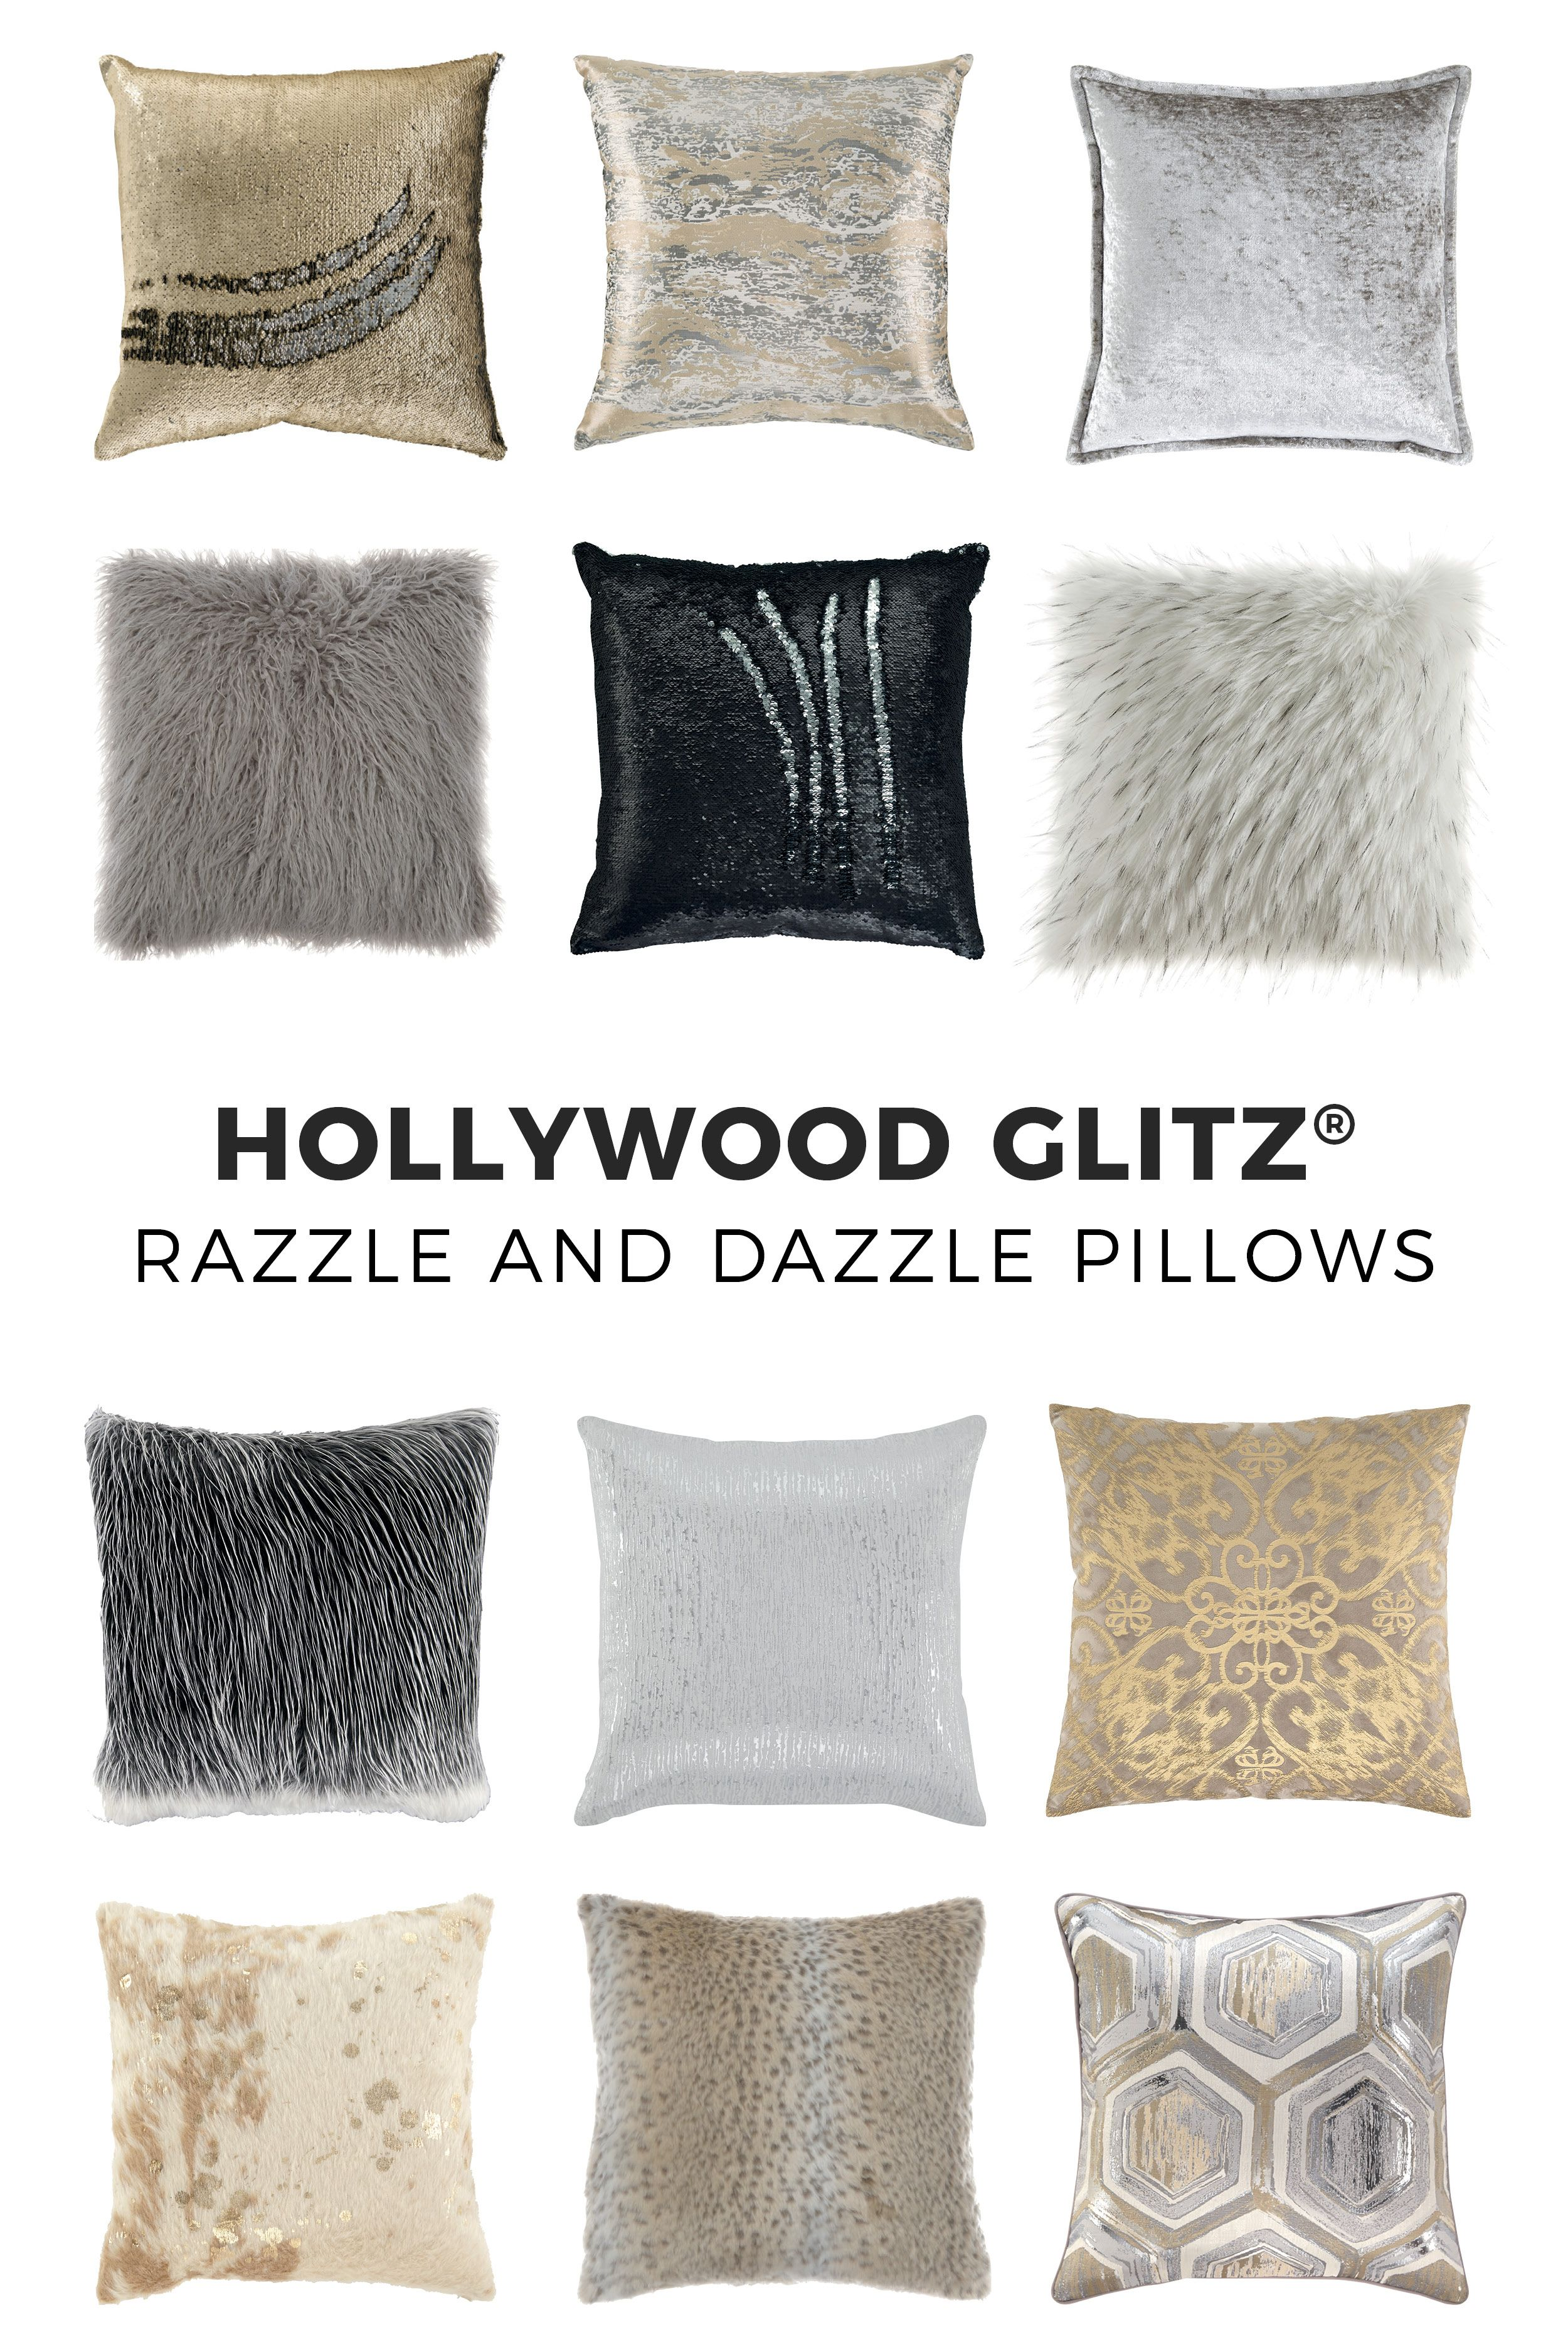 Razzle And Dazzle With These Hollywood Glitz Pillows By Ashley Furniture Ashleyfurniture Hollywoodglitz